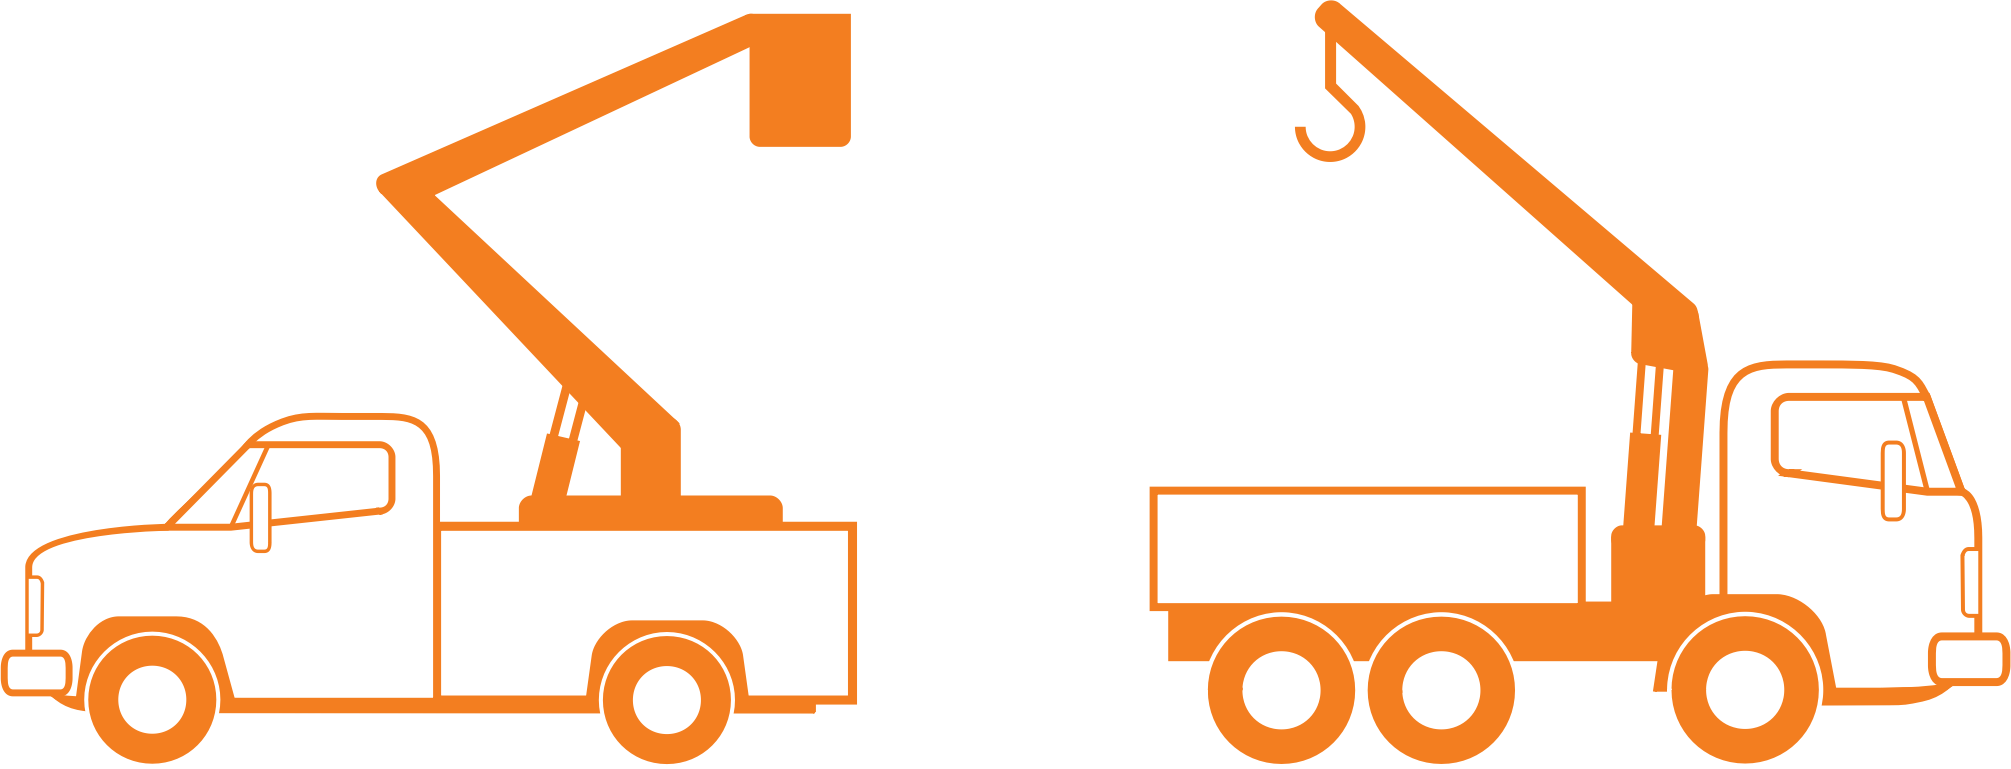 Lift and trucks big. Crane clipart work vehicle